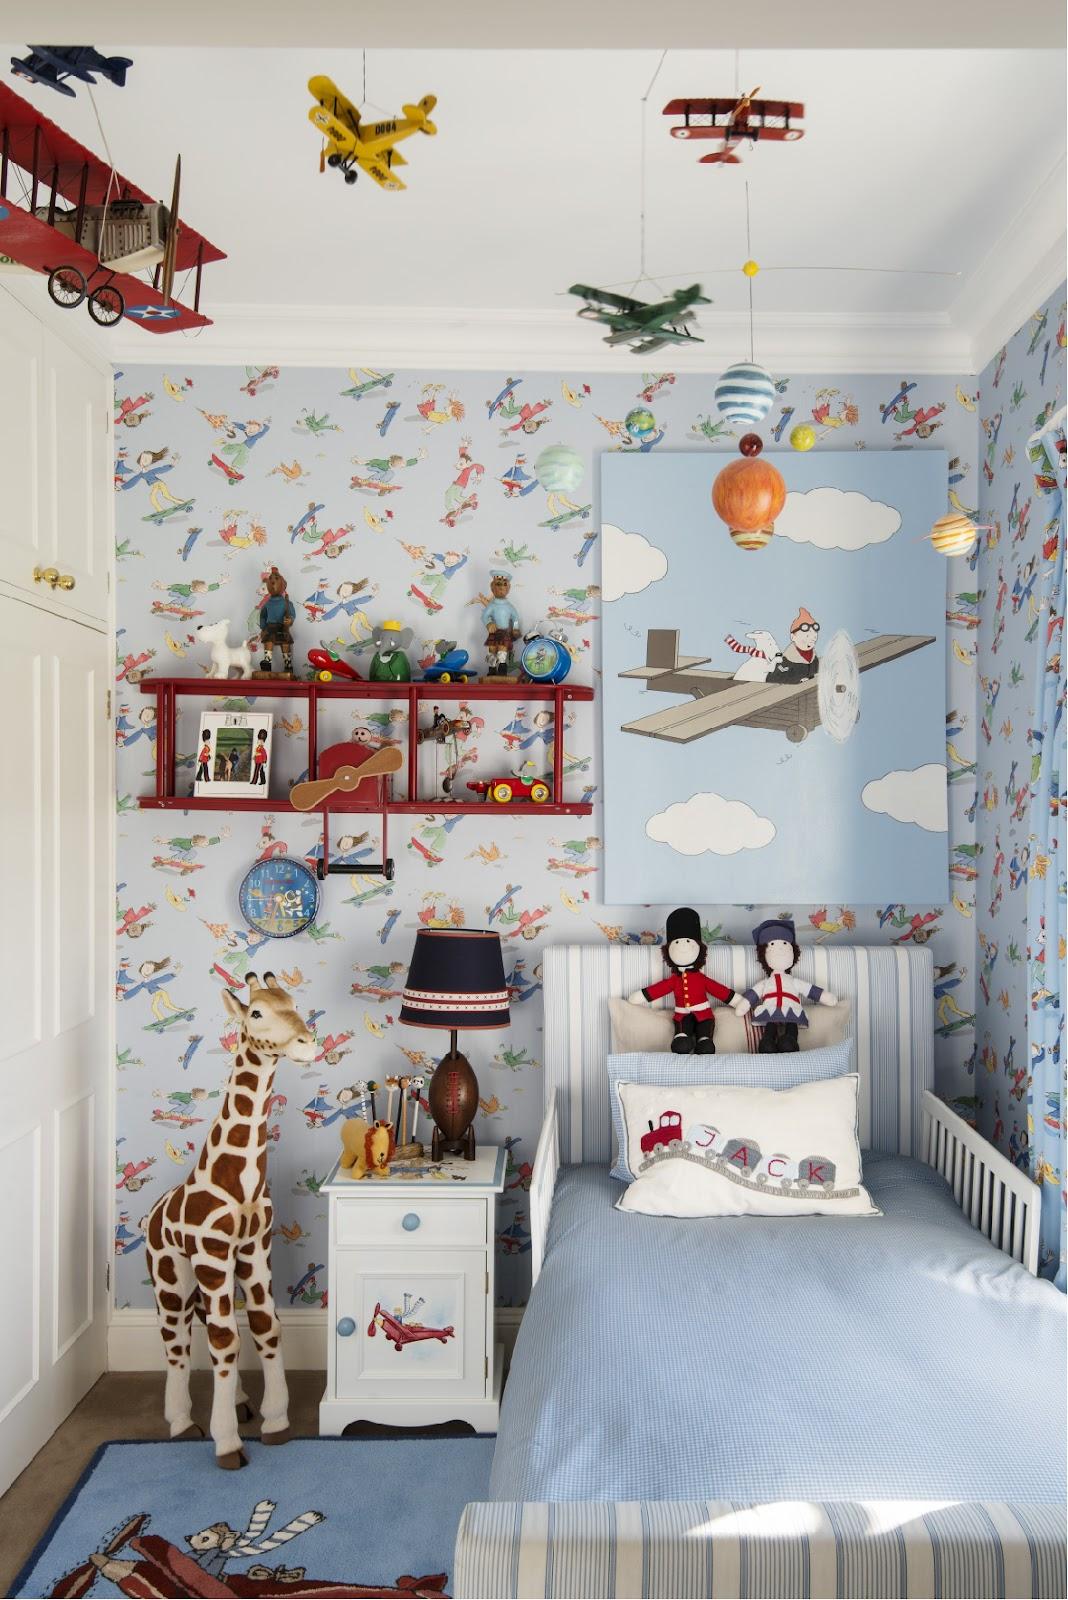 Display Favorite Toys for Boy Bedroom Ideas